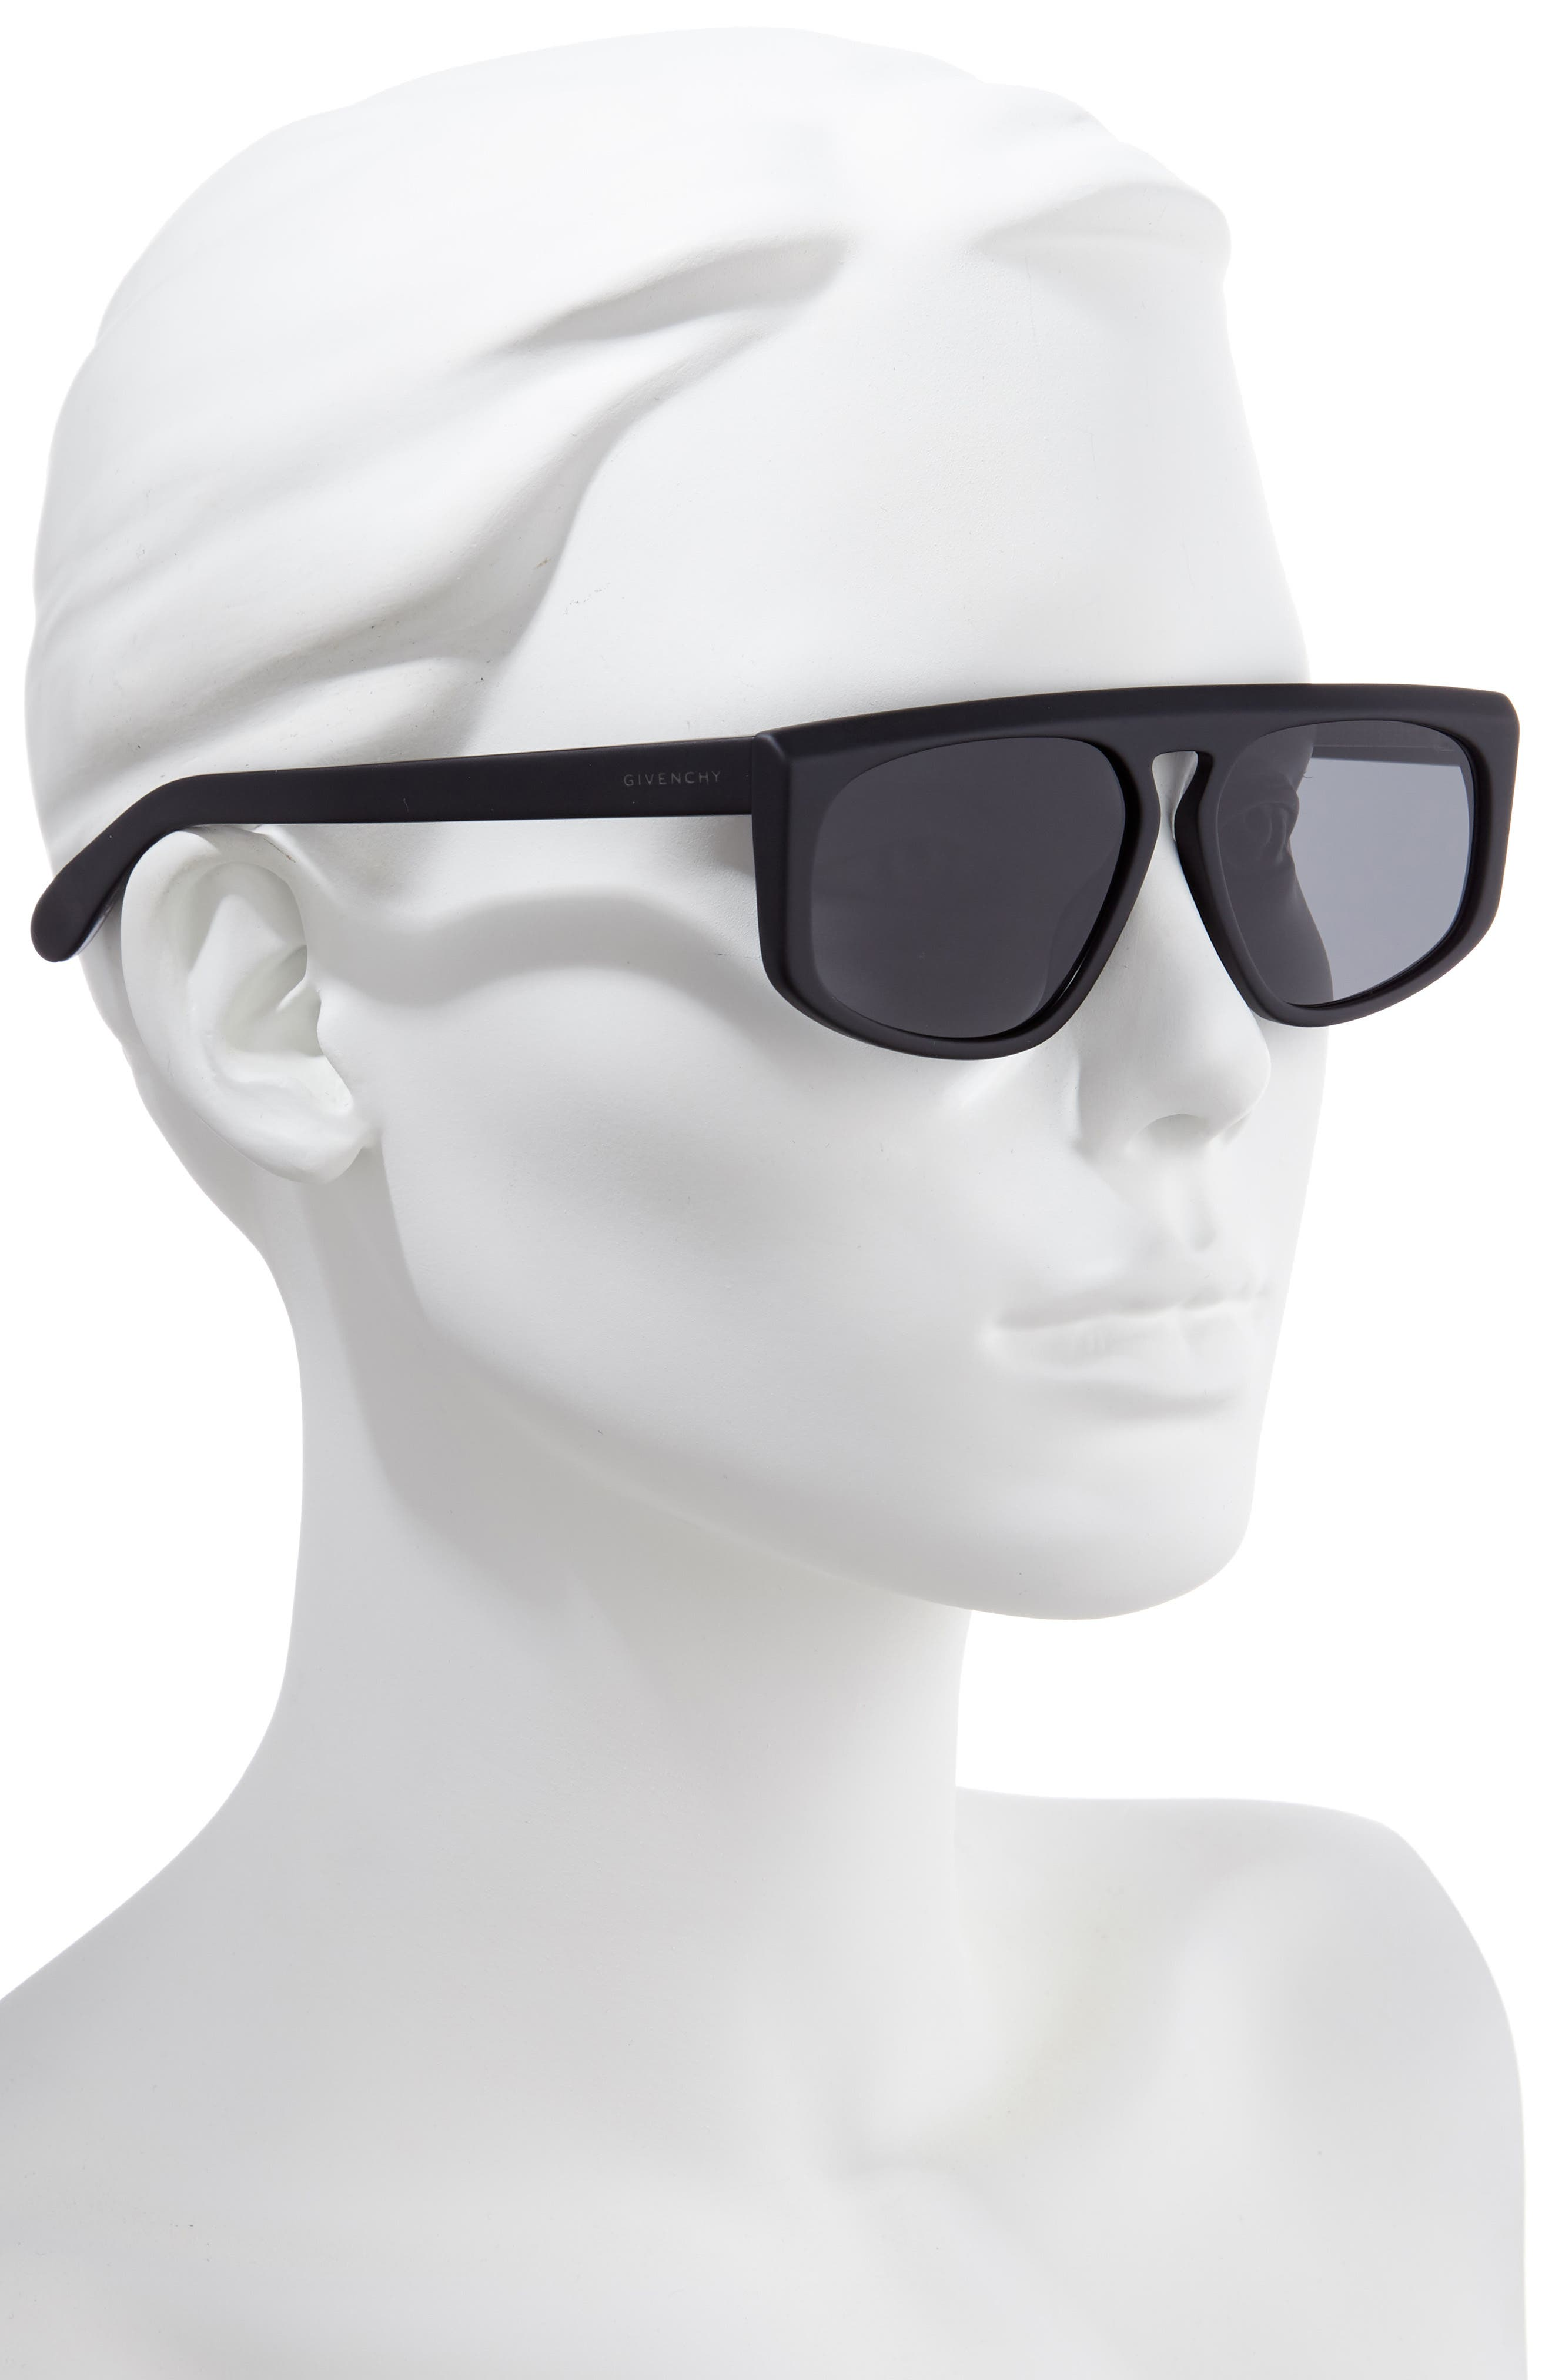 55mm Flat Top Sunglasses,                             Alternate thumbnail 2, color,                             MATTE BLACK